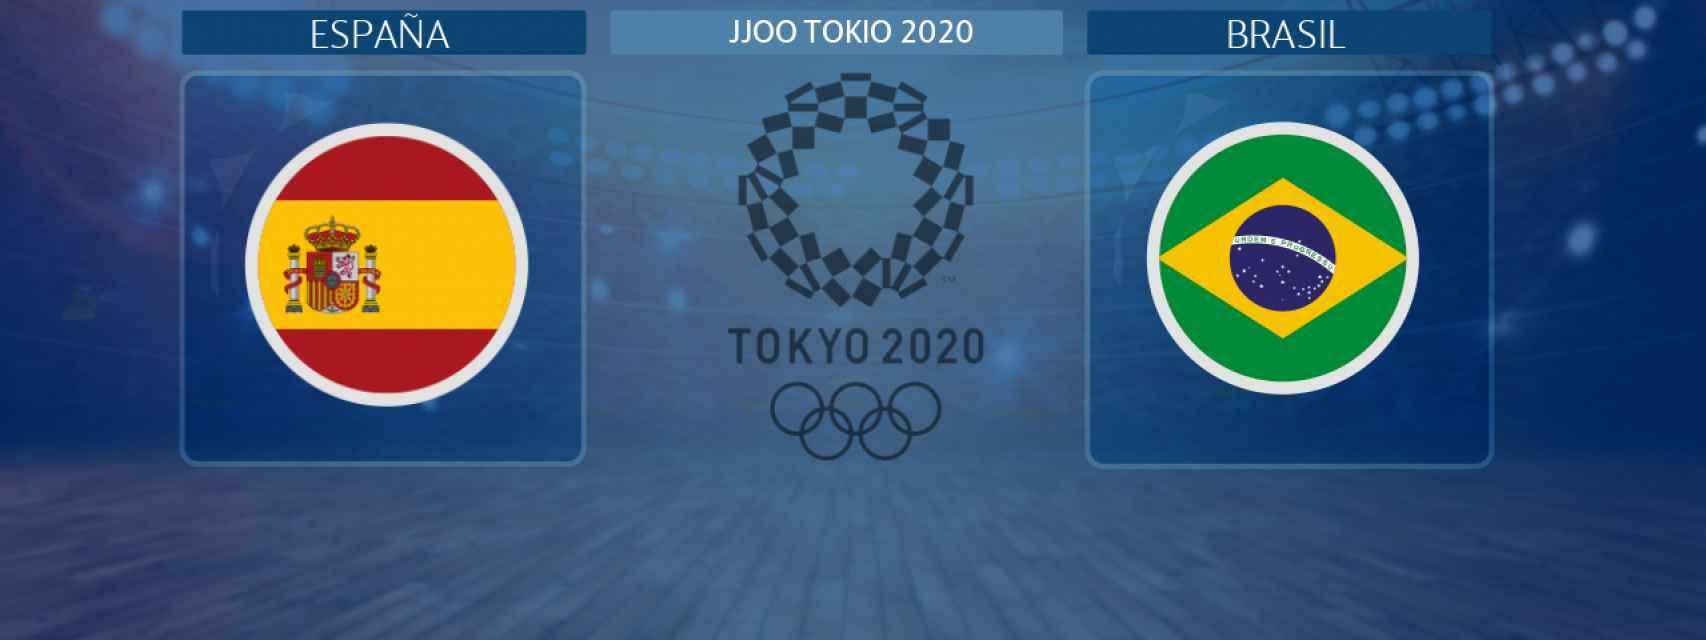 España - Brasil, partido de balonmano femenino de los JJOO Tokio 2020